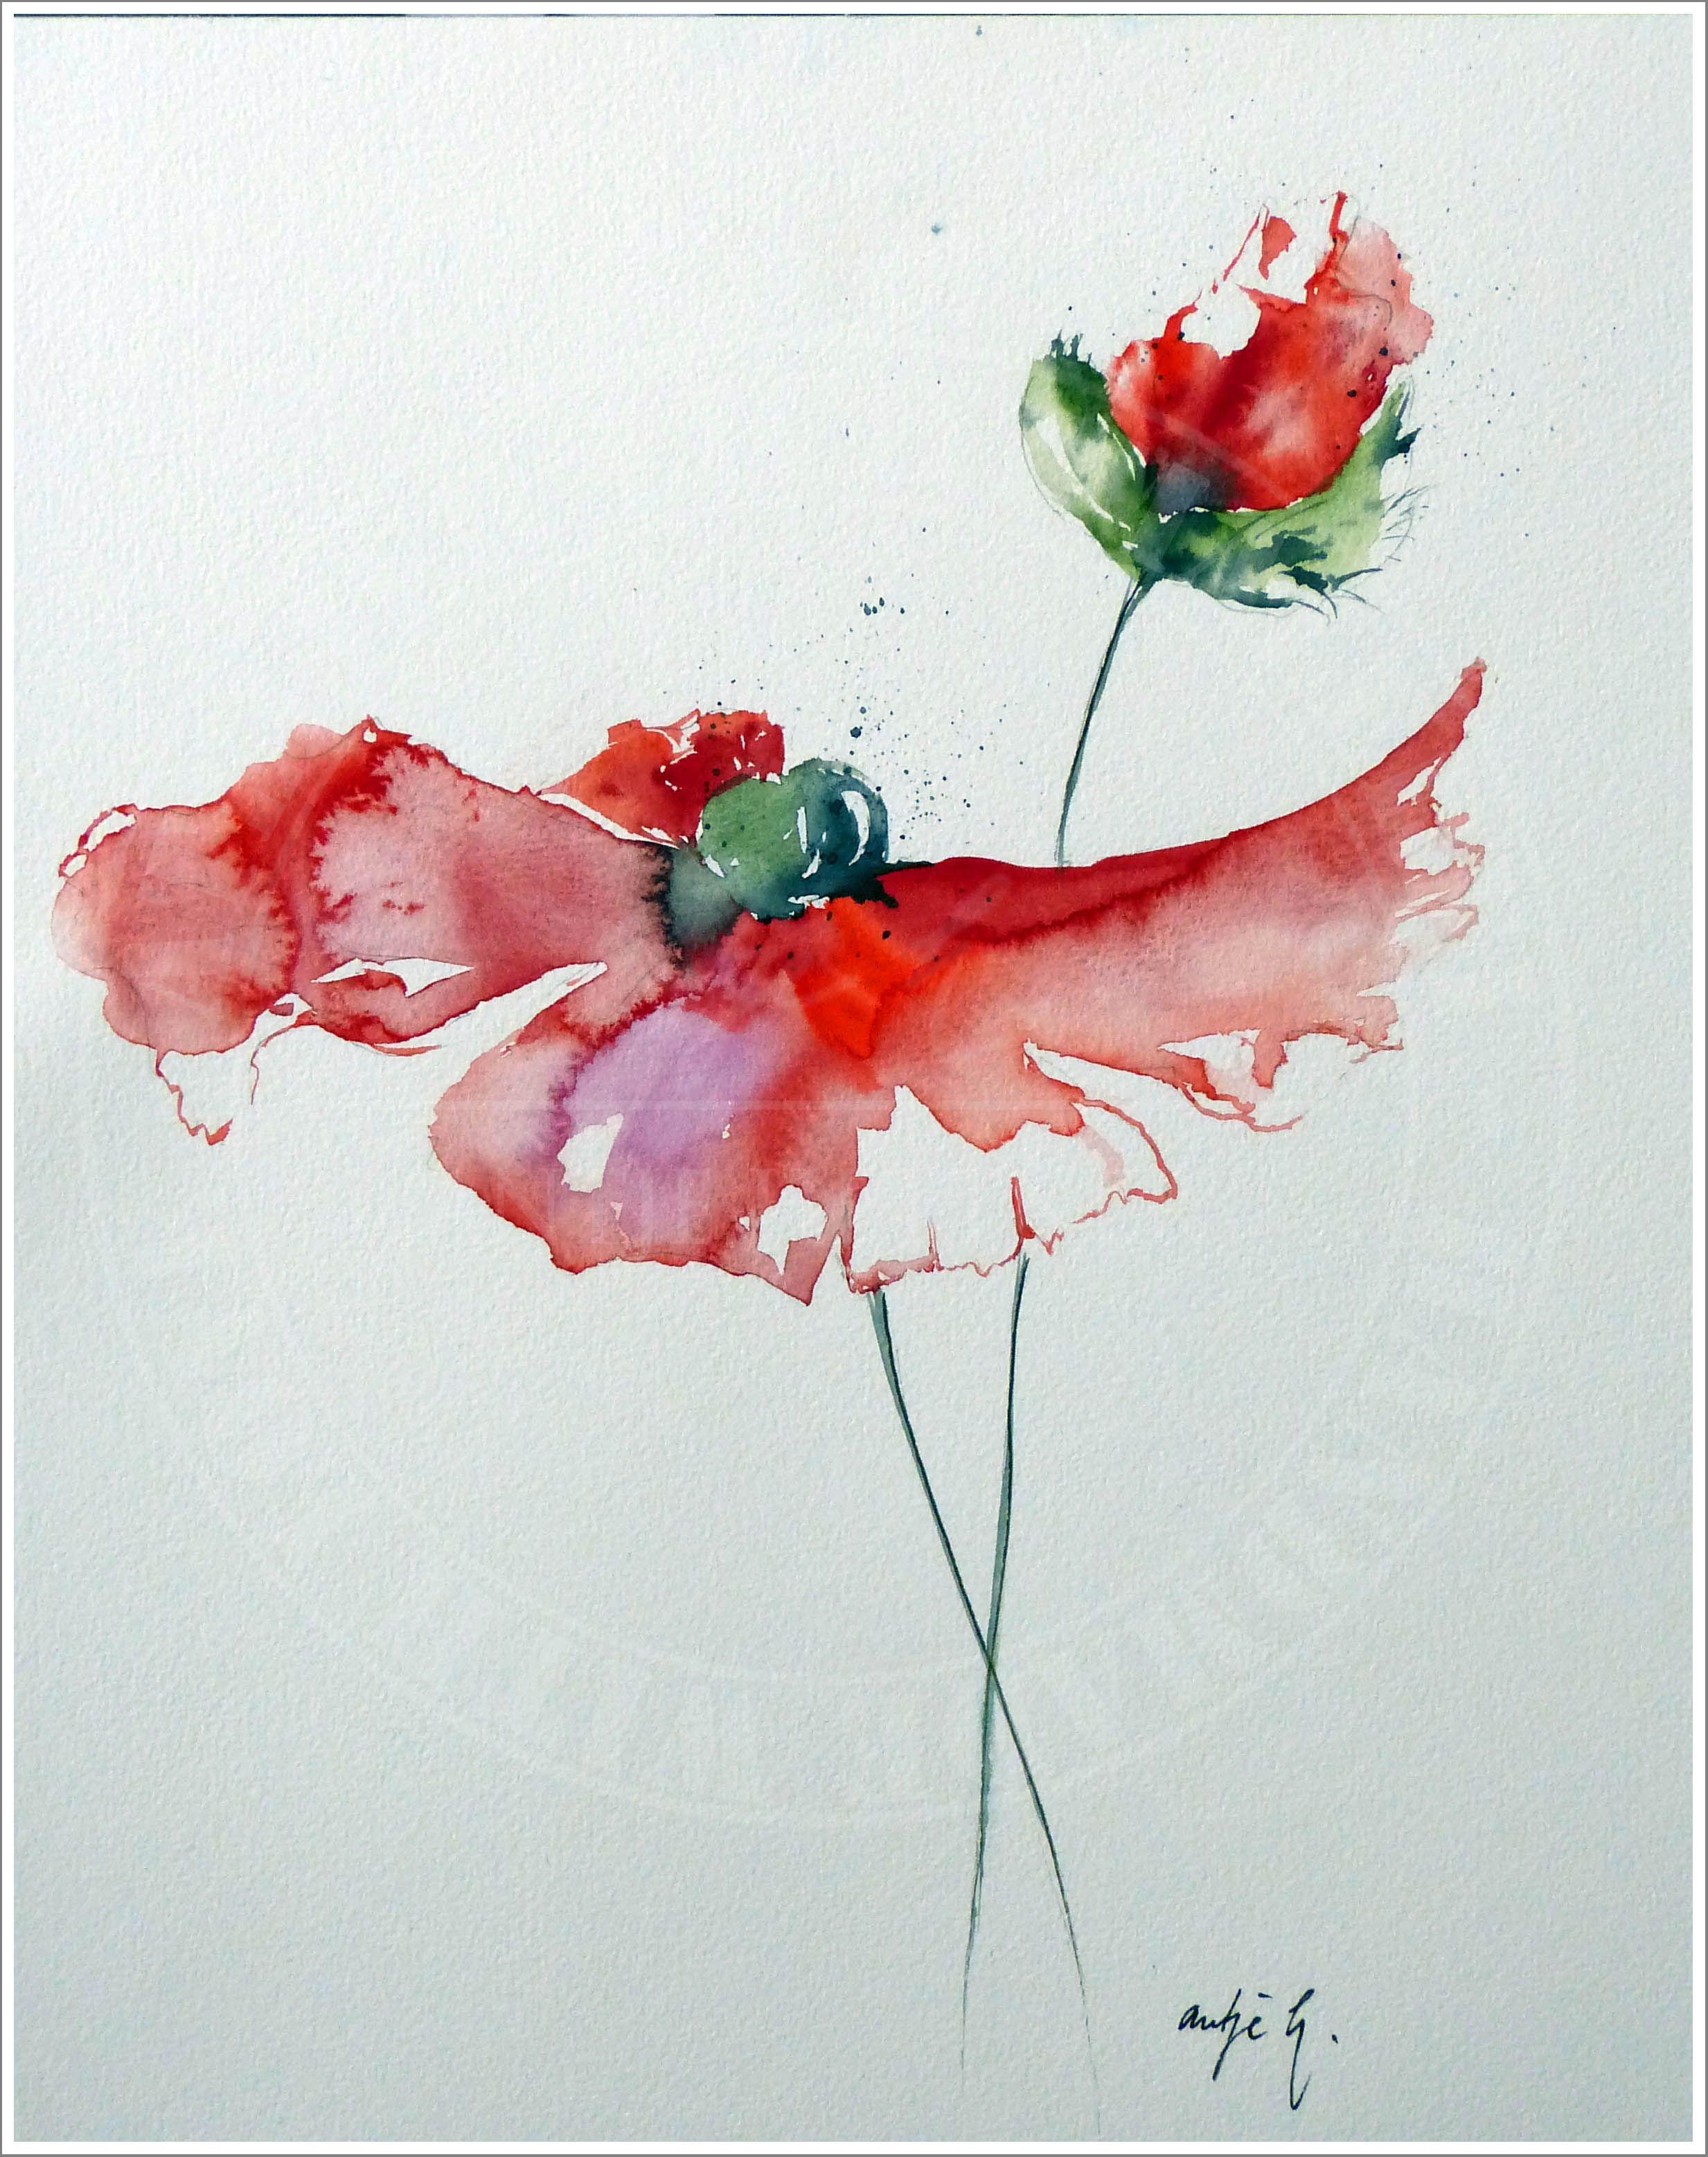 Mohnvariation Watercolor 24x30 Antje Hettner Aquarell Watercolor Kunst Malerei Blumen Original Flowers Paintin Blumen Kunst Wie Man Blumen Malt Vintage Kunst